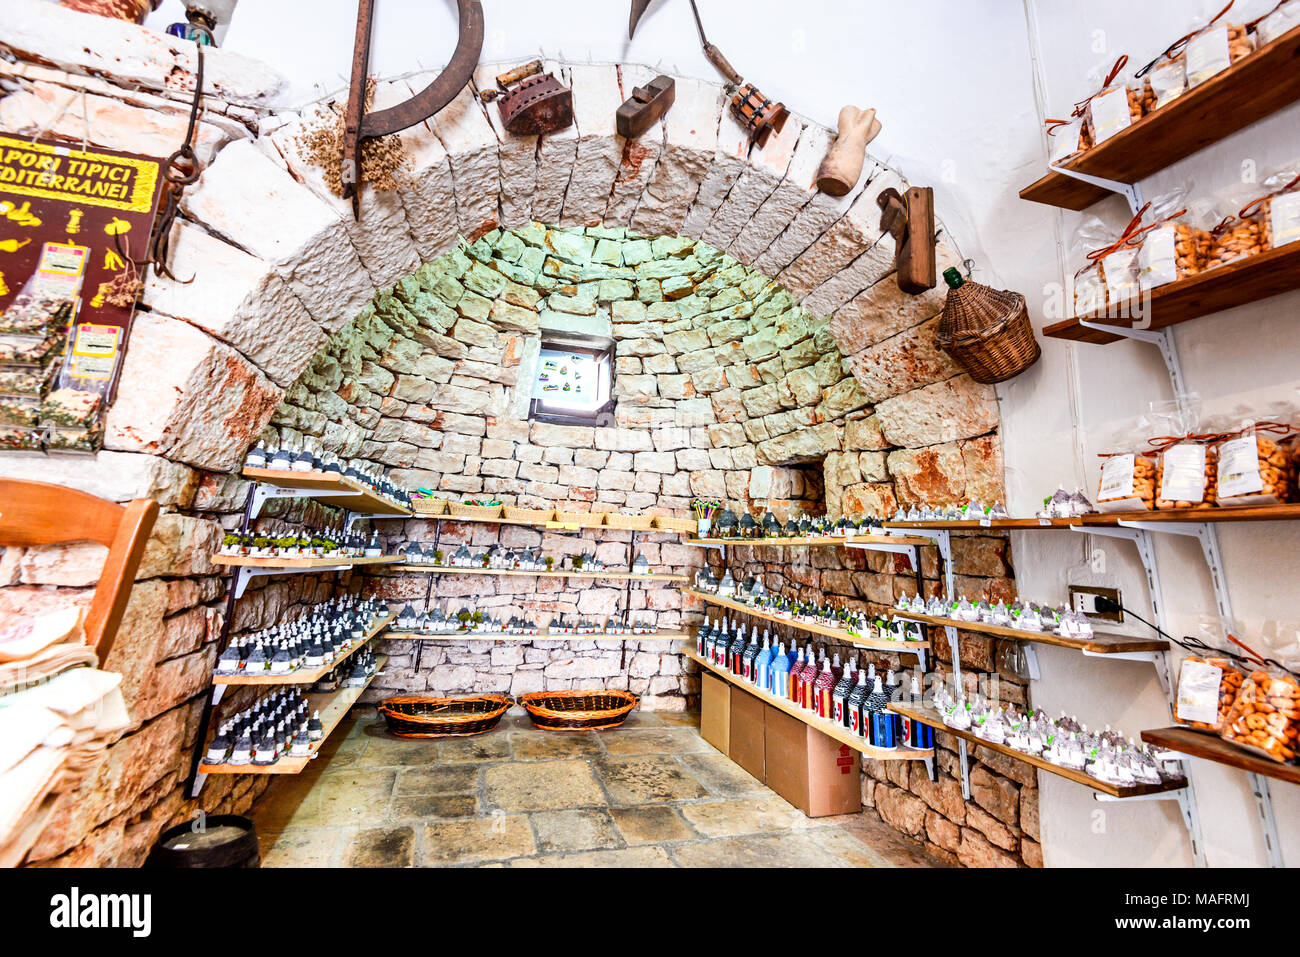 Alberobello, Italia - 10 de julio de 2015: Trullo tradicional casa con tienda de souvenir en Alberobello, Puglia. Imagen De Stock